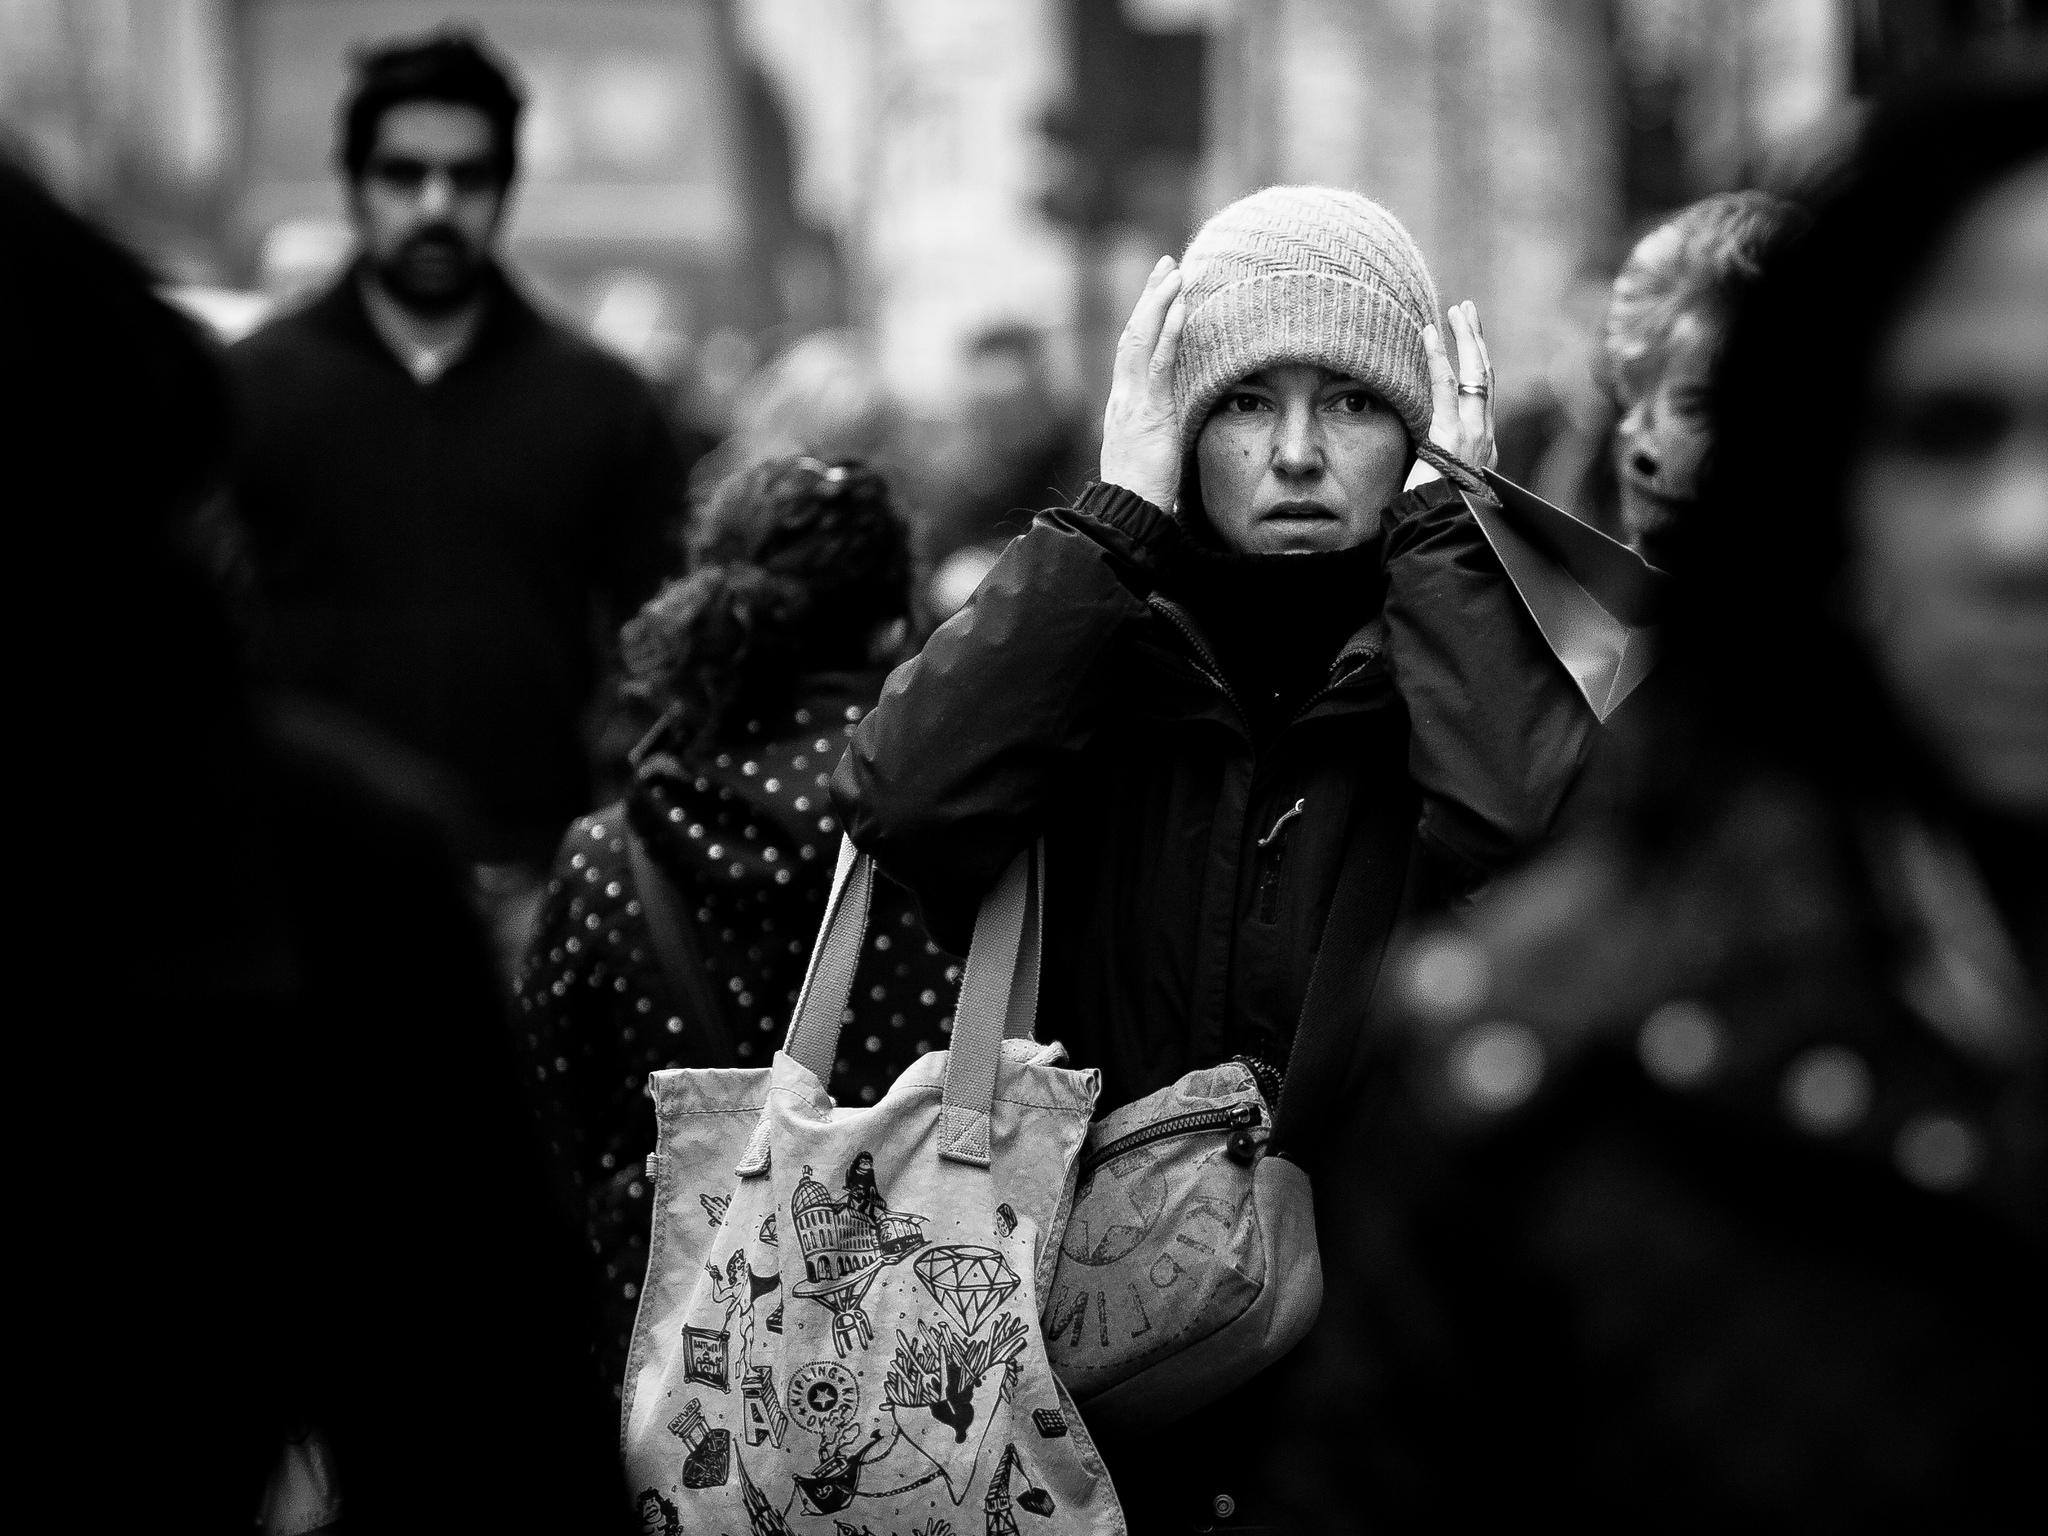 Thinking Christmas shopping. Flickr -  Hernán Piñera.